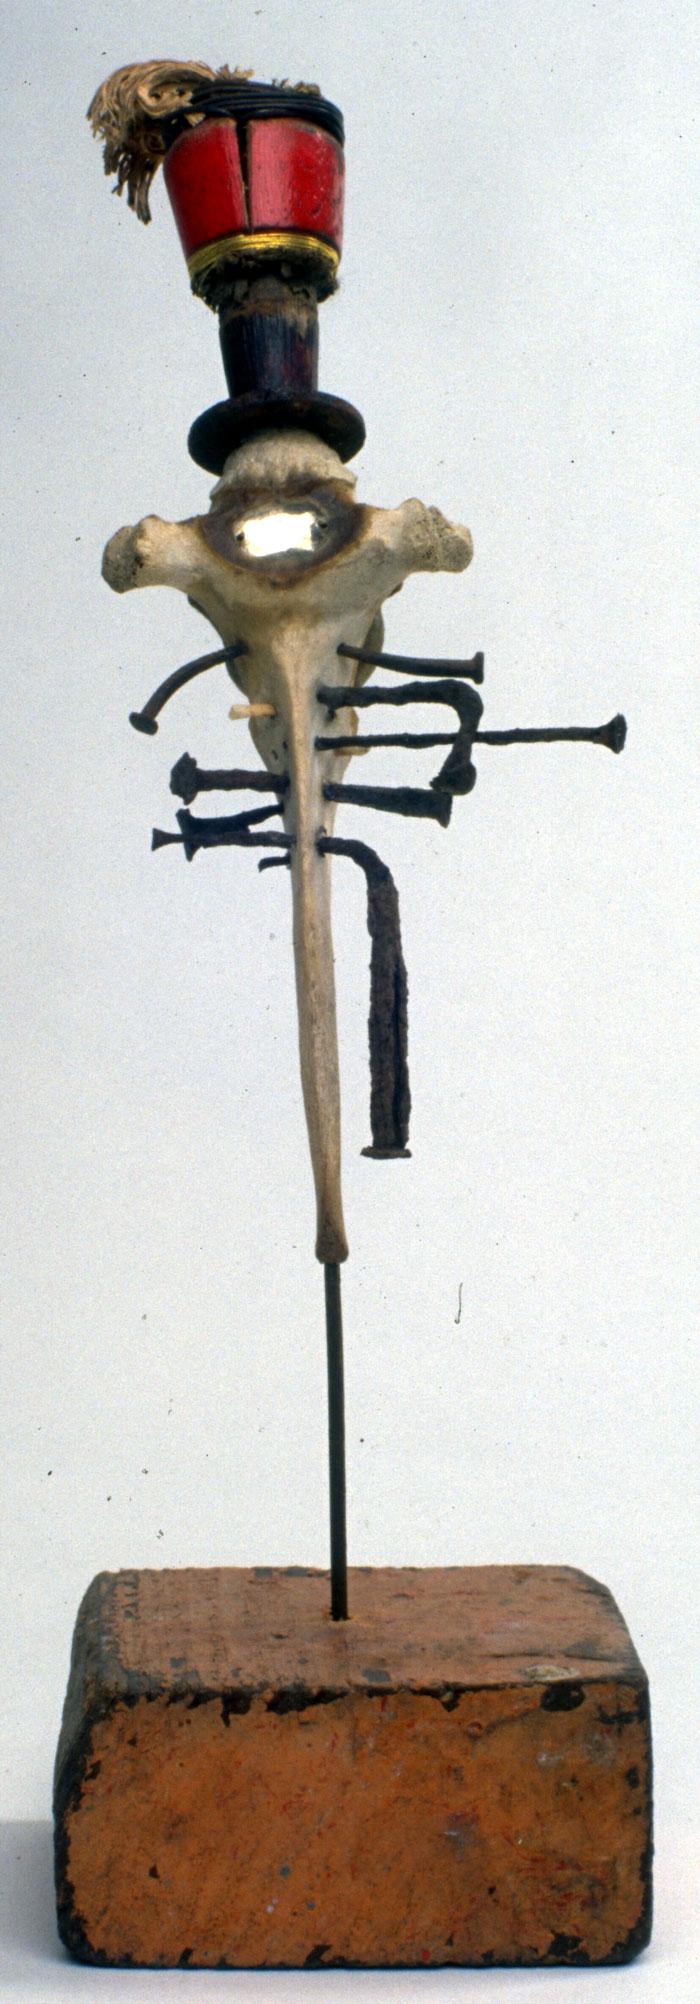 Bochio, 2000